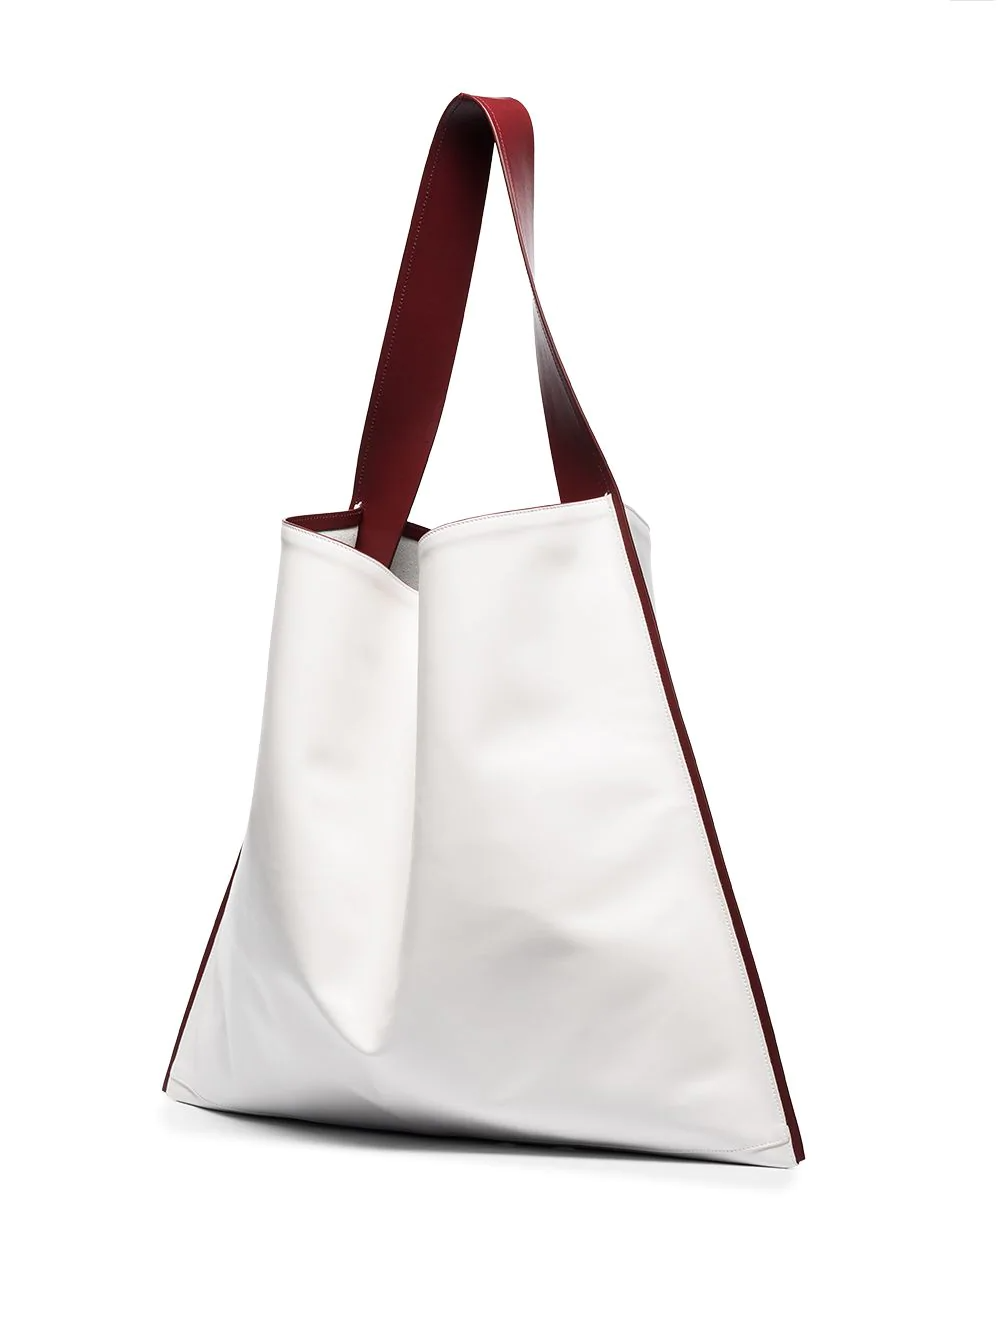 White Shopping Bag Bags Clip Art Paper Shopping Bag